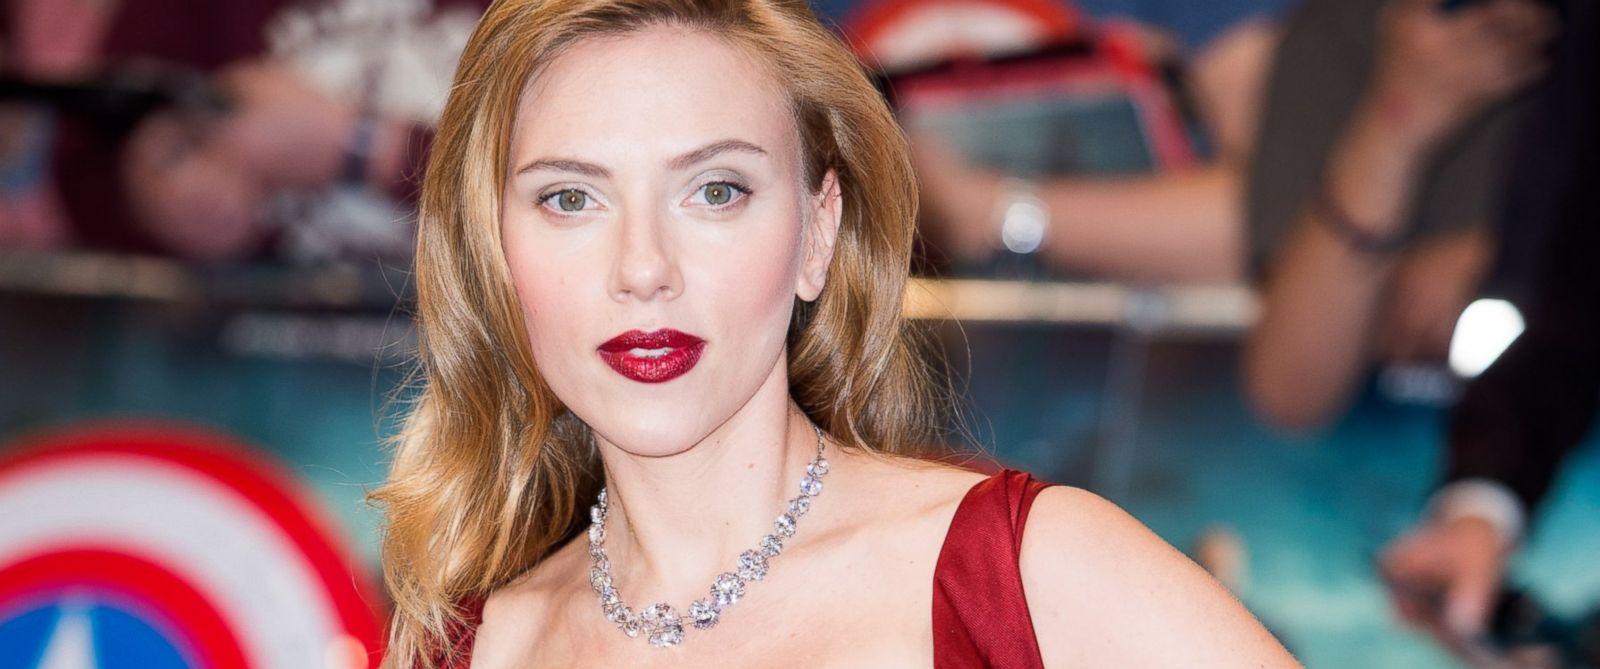 "PHOTO: Scarlett Johansson attends the ""Captain America: The Winter Soldier"" UK Film Premiere in London, March 20, 2014."